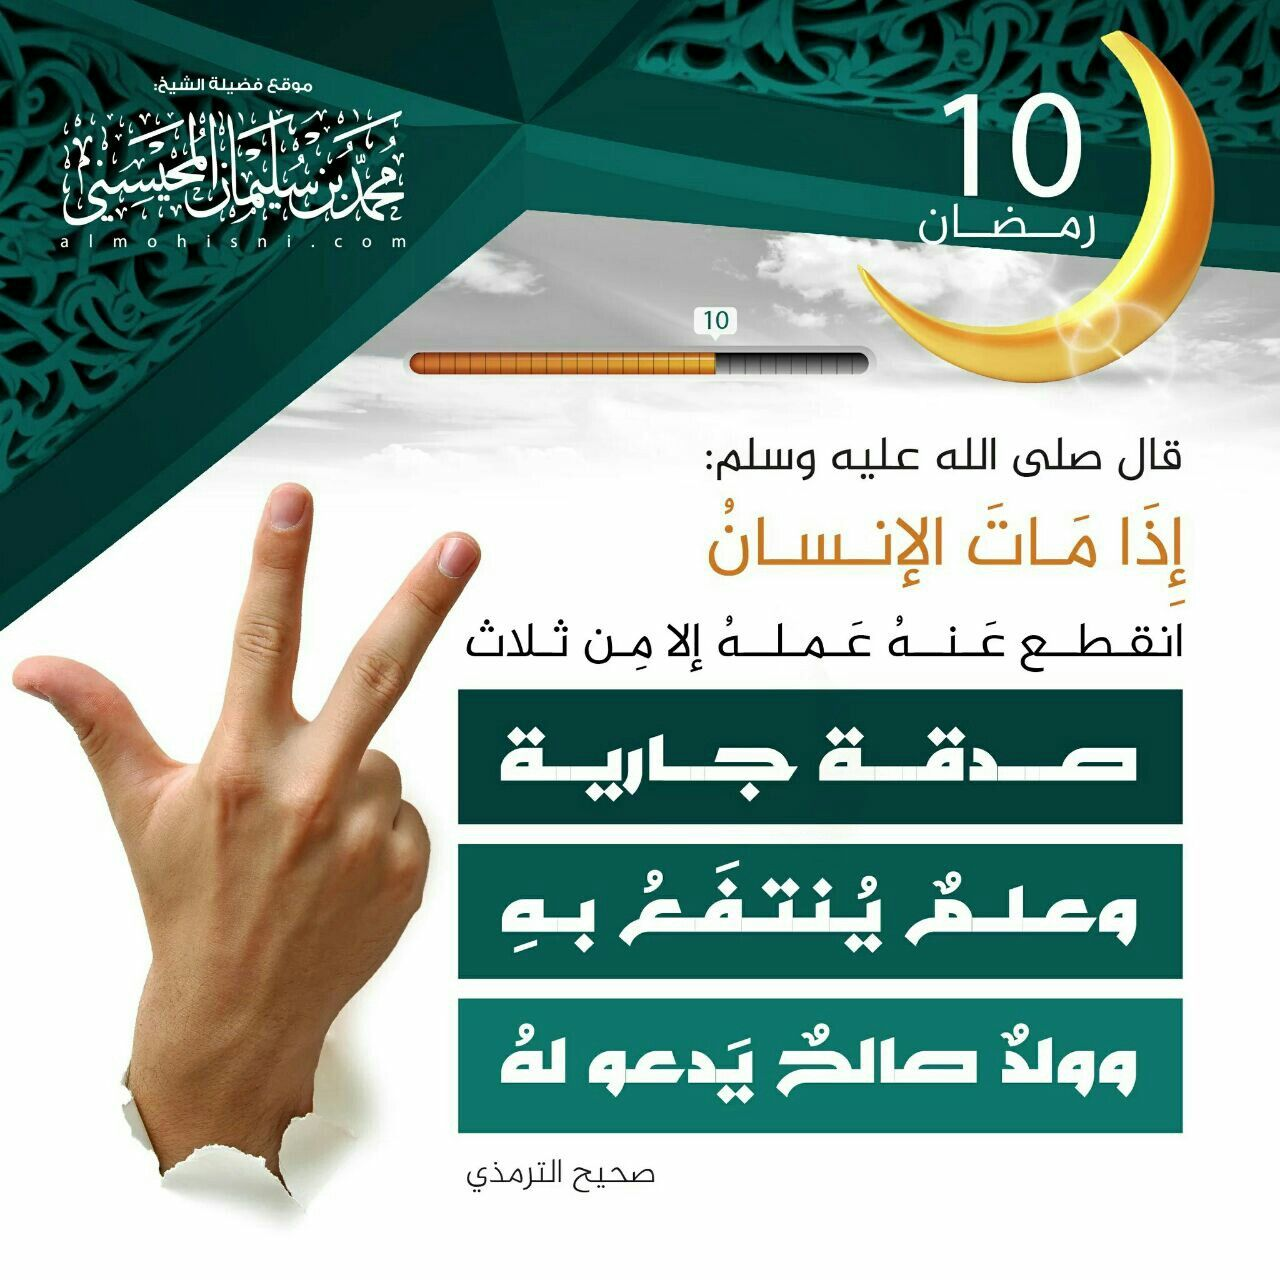 Pin By Thanaa Moustafa On صور دعوية 3 Islam 10 Things